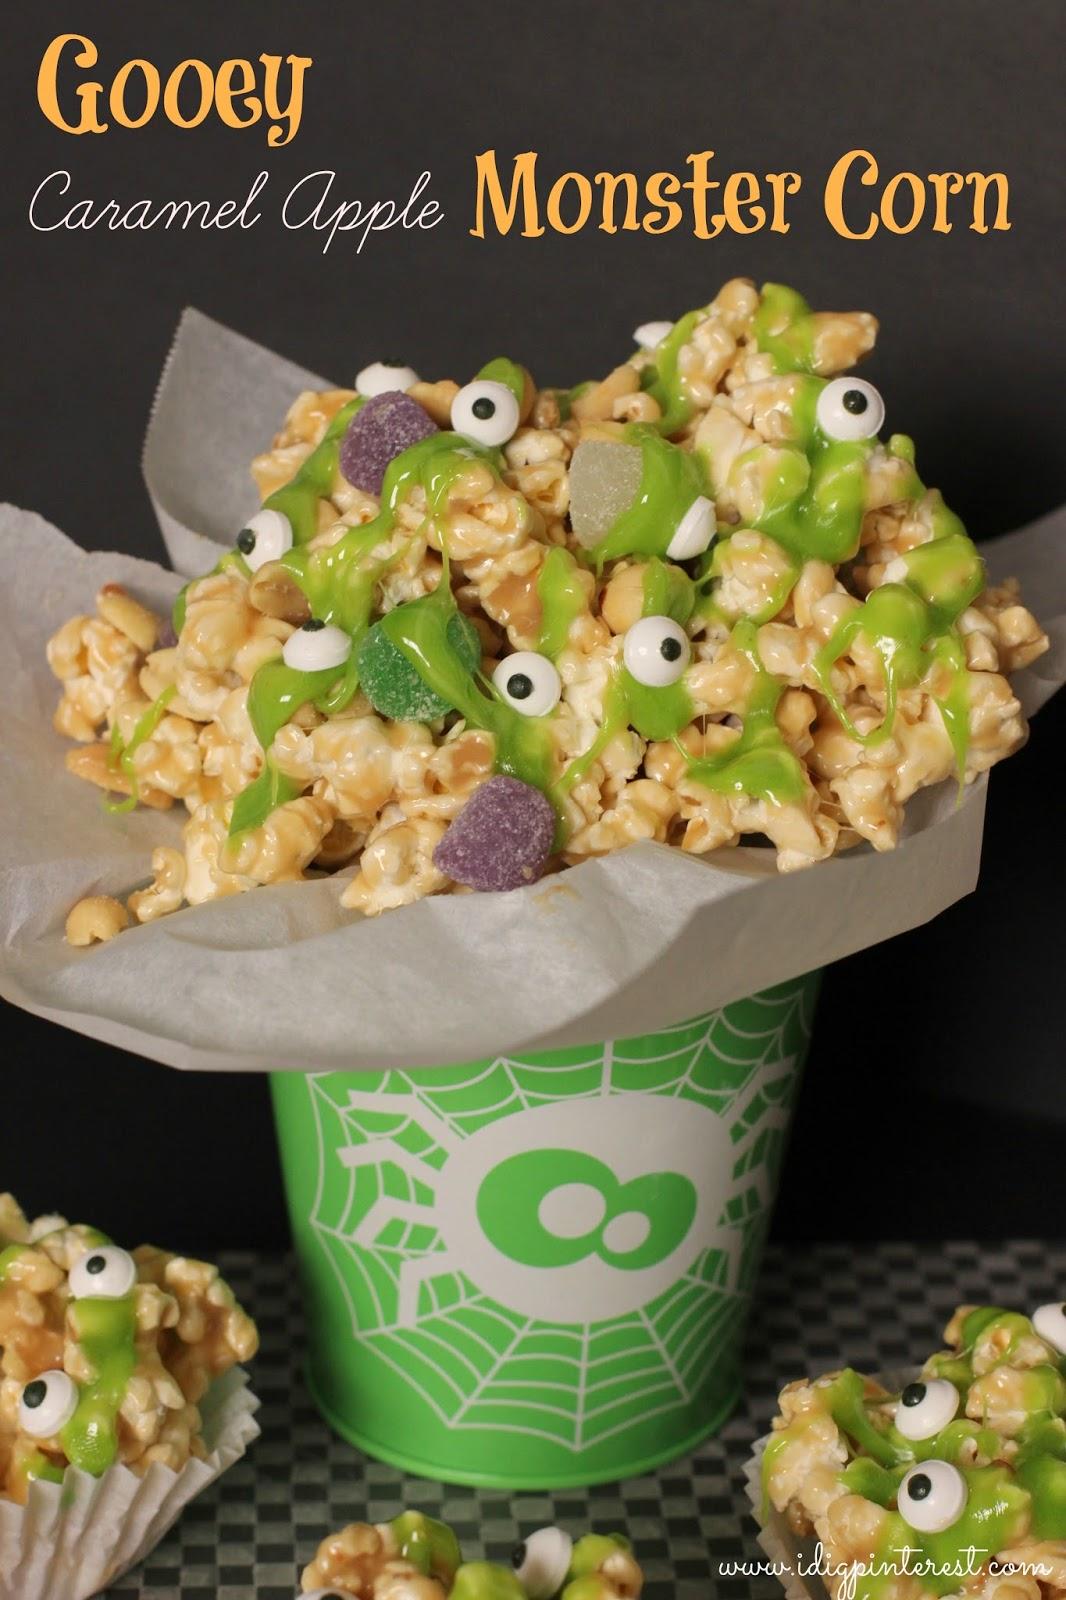 halloween candy apple ideas gooey caramel apple monster corn i dig pinterest - Caramel Apple Ideas Halloween